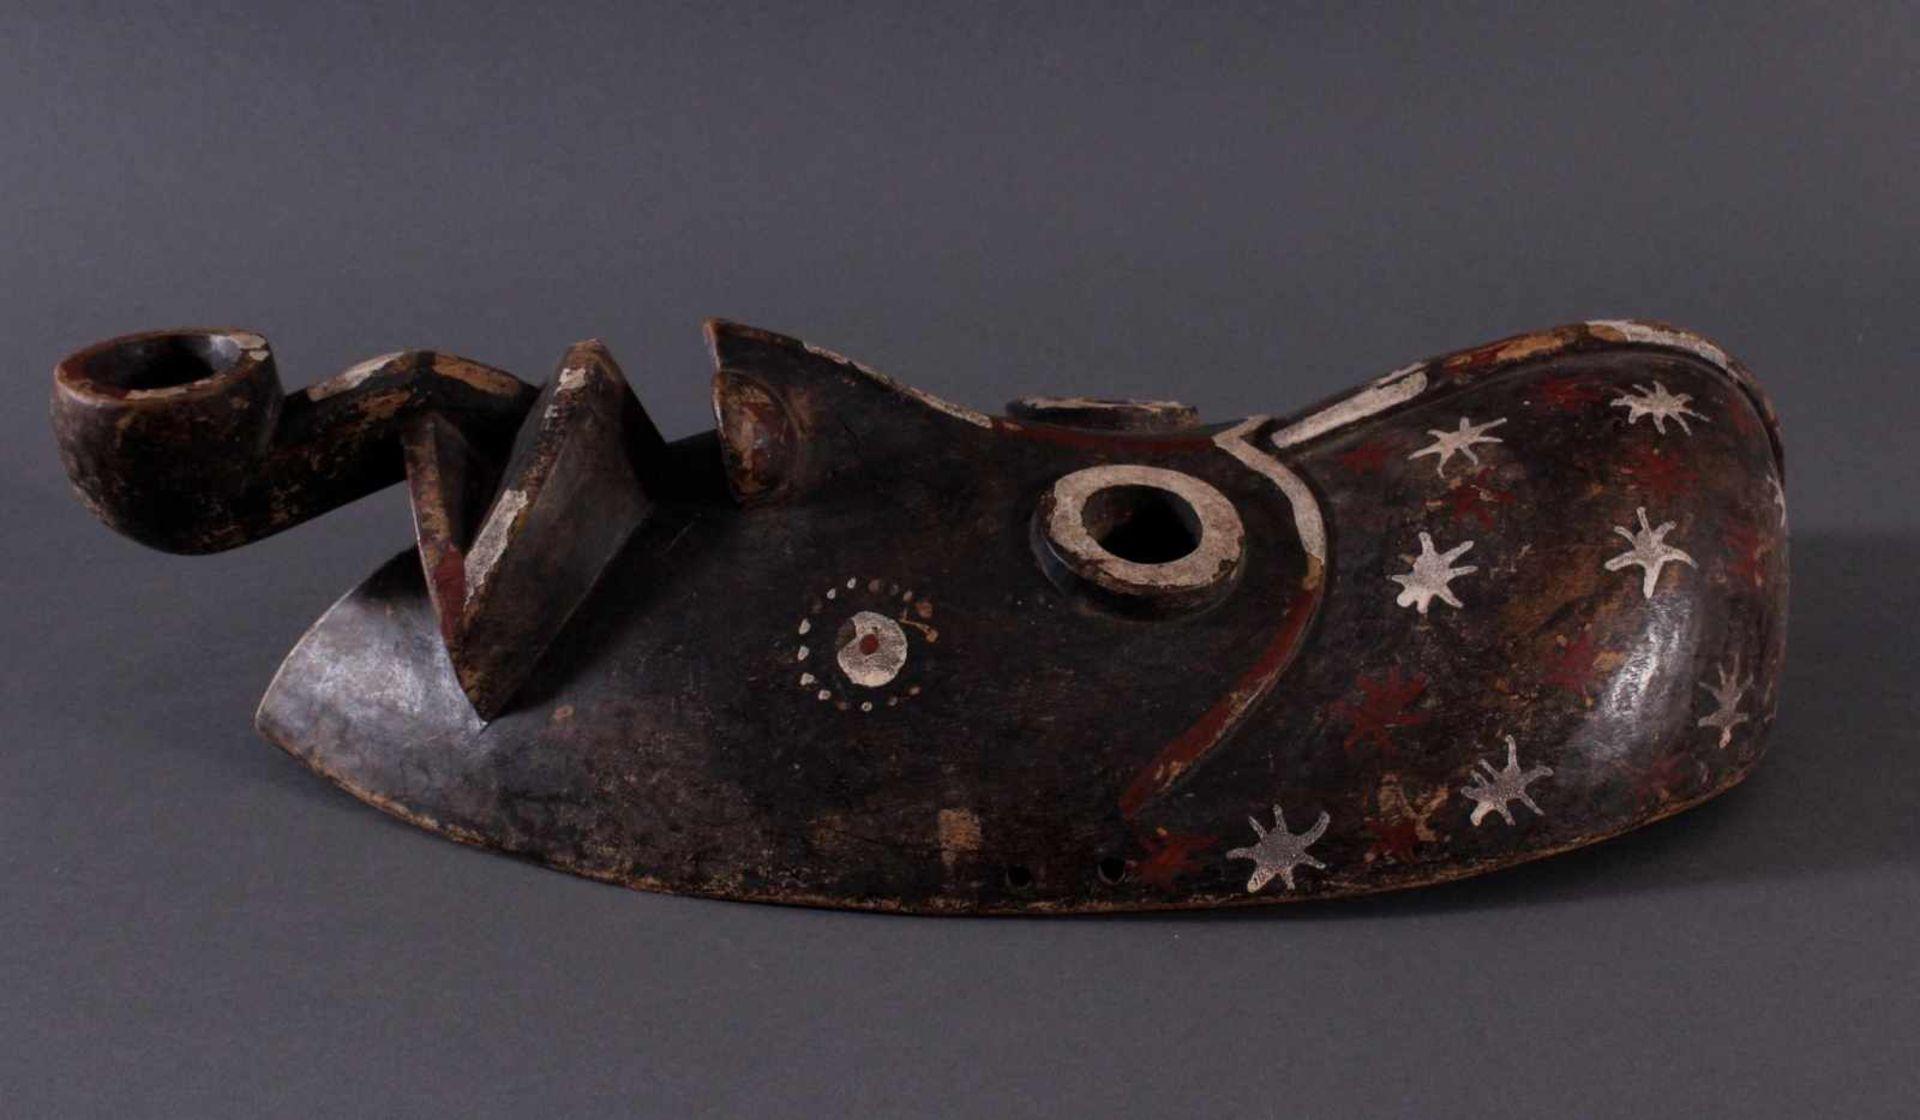 "Antike Holzmaske der Dan, 1. Hälfte 20. Jh.Holz geschnitzt, ""Pfeifenraucher"", dunkle Patina, - Bild 3 aus 4"